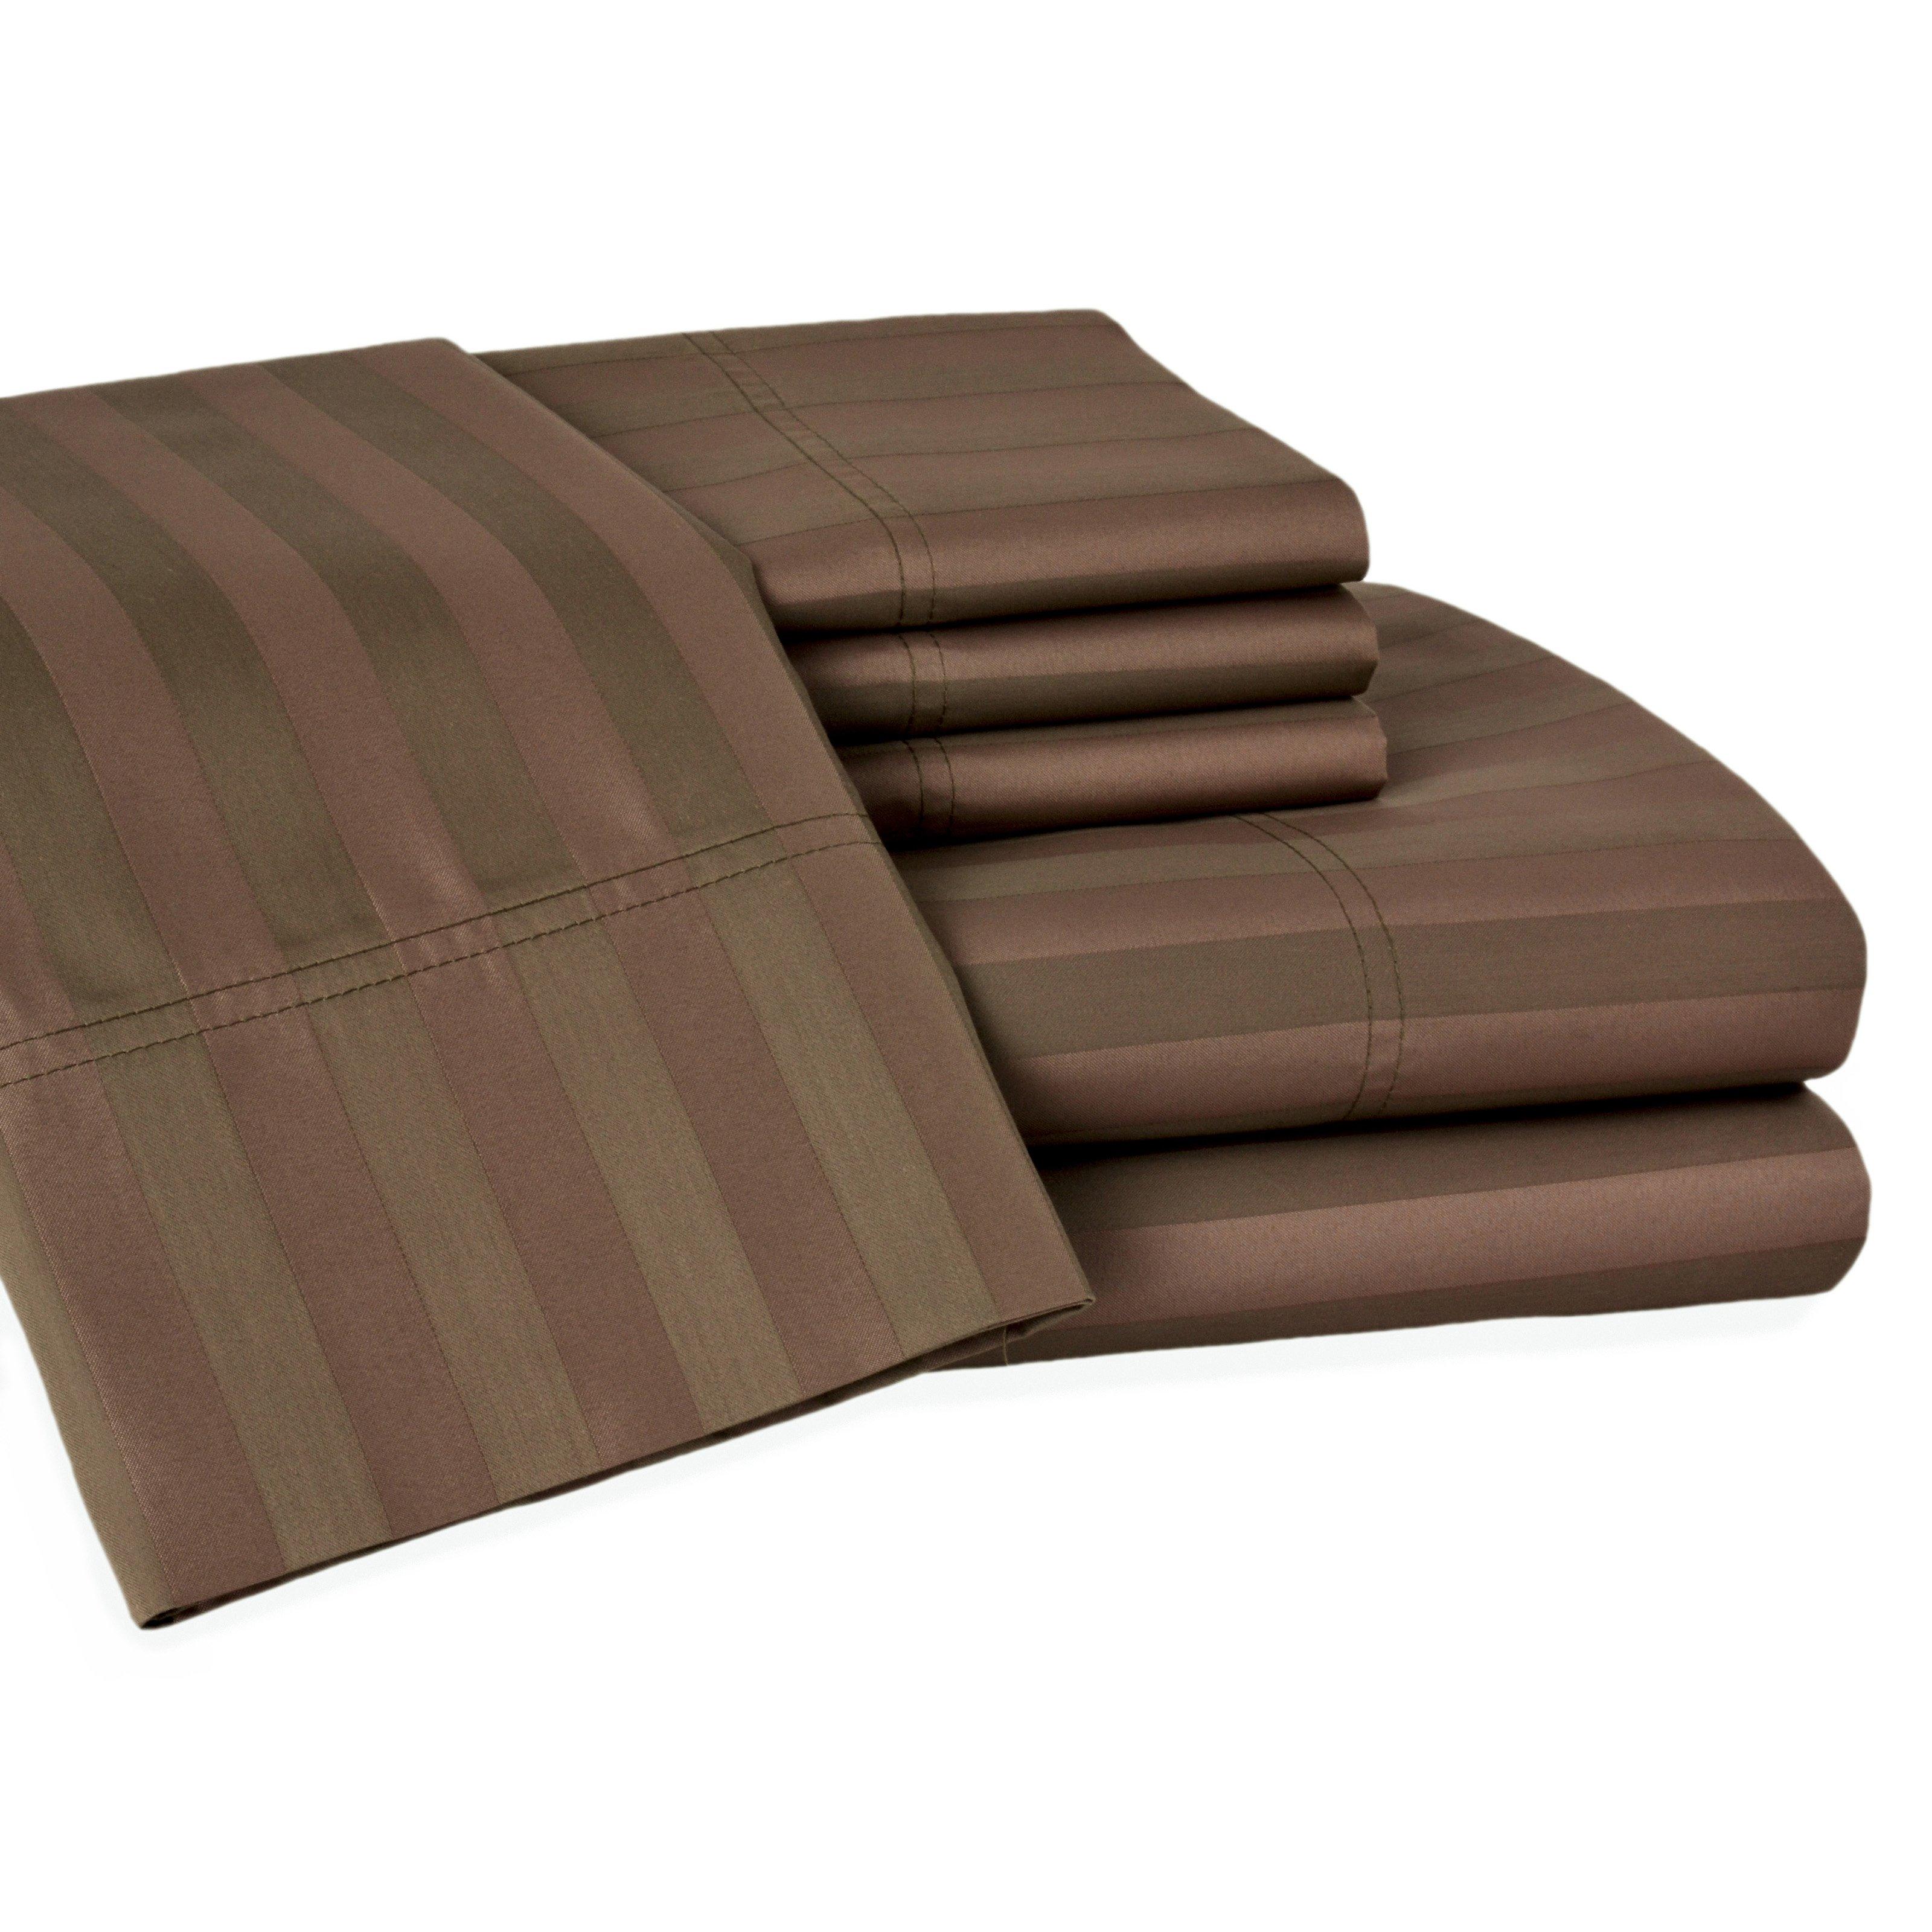 Elite Home T600 Delray Cotton Rich 6 pc. Sheet Set